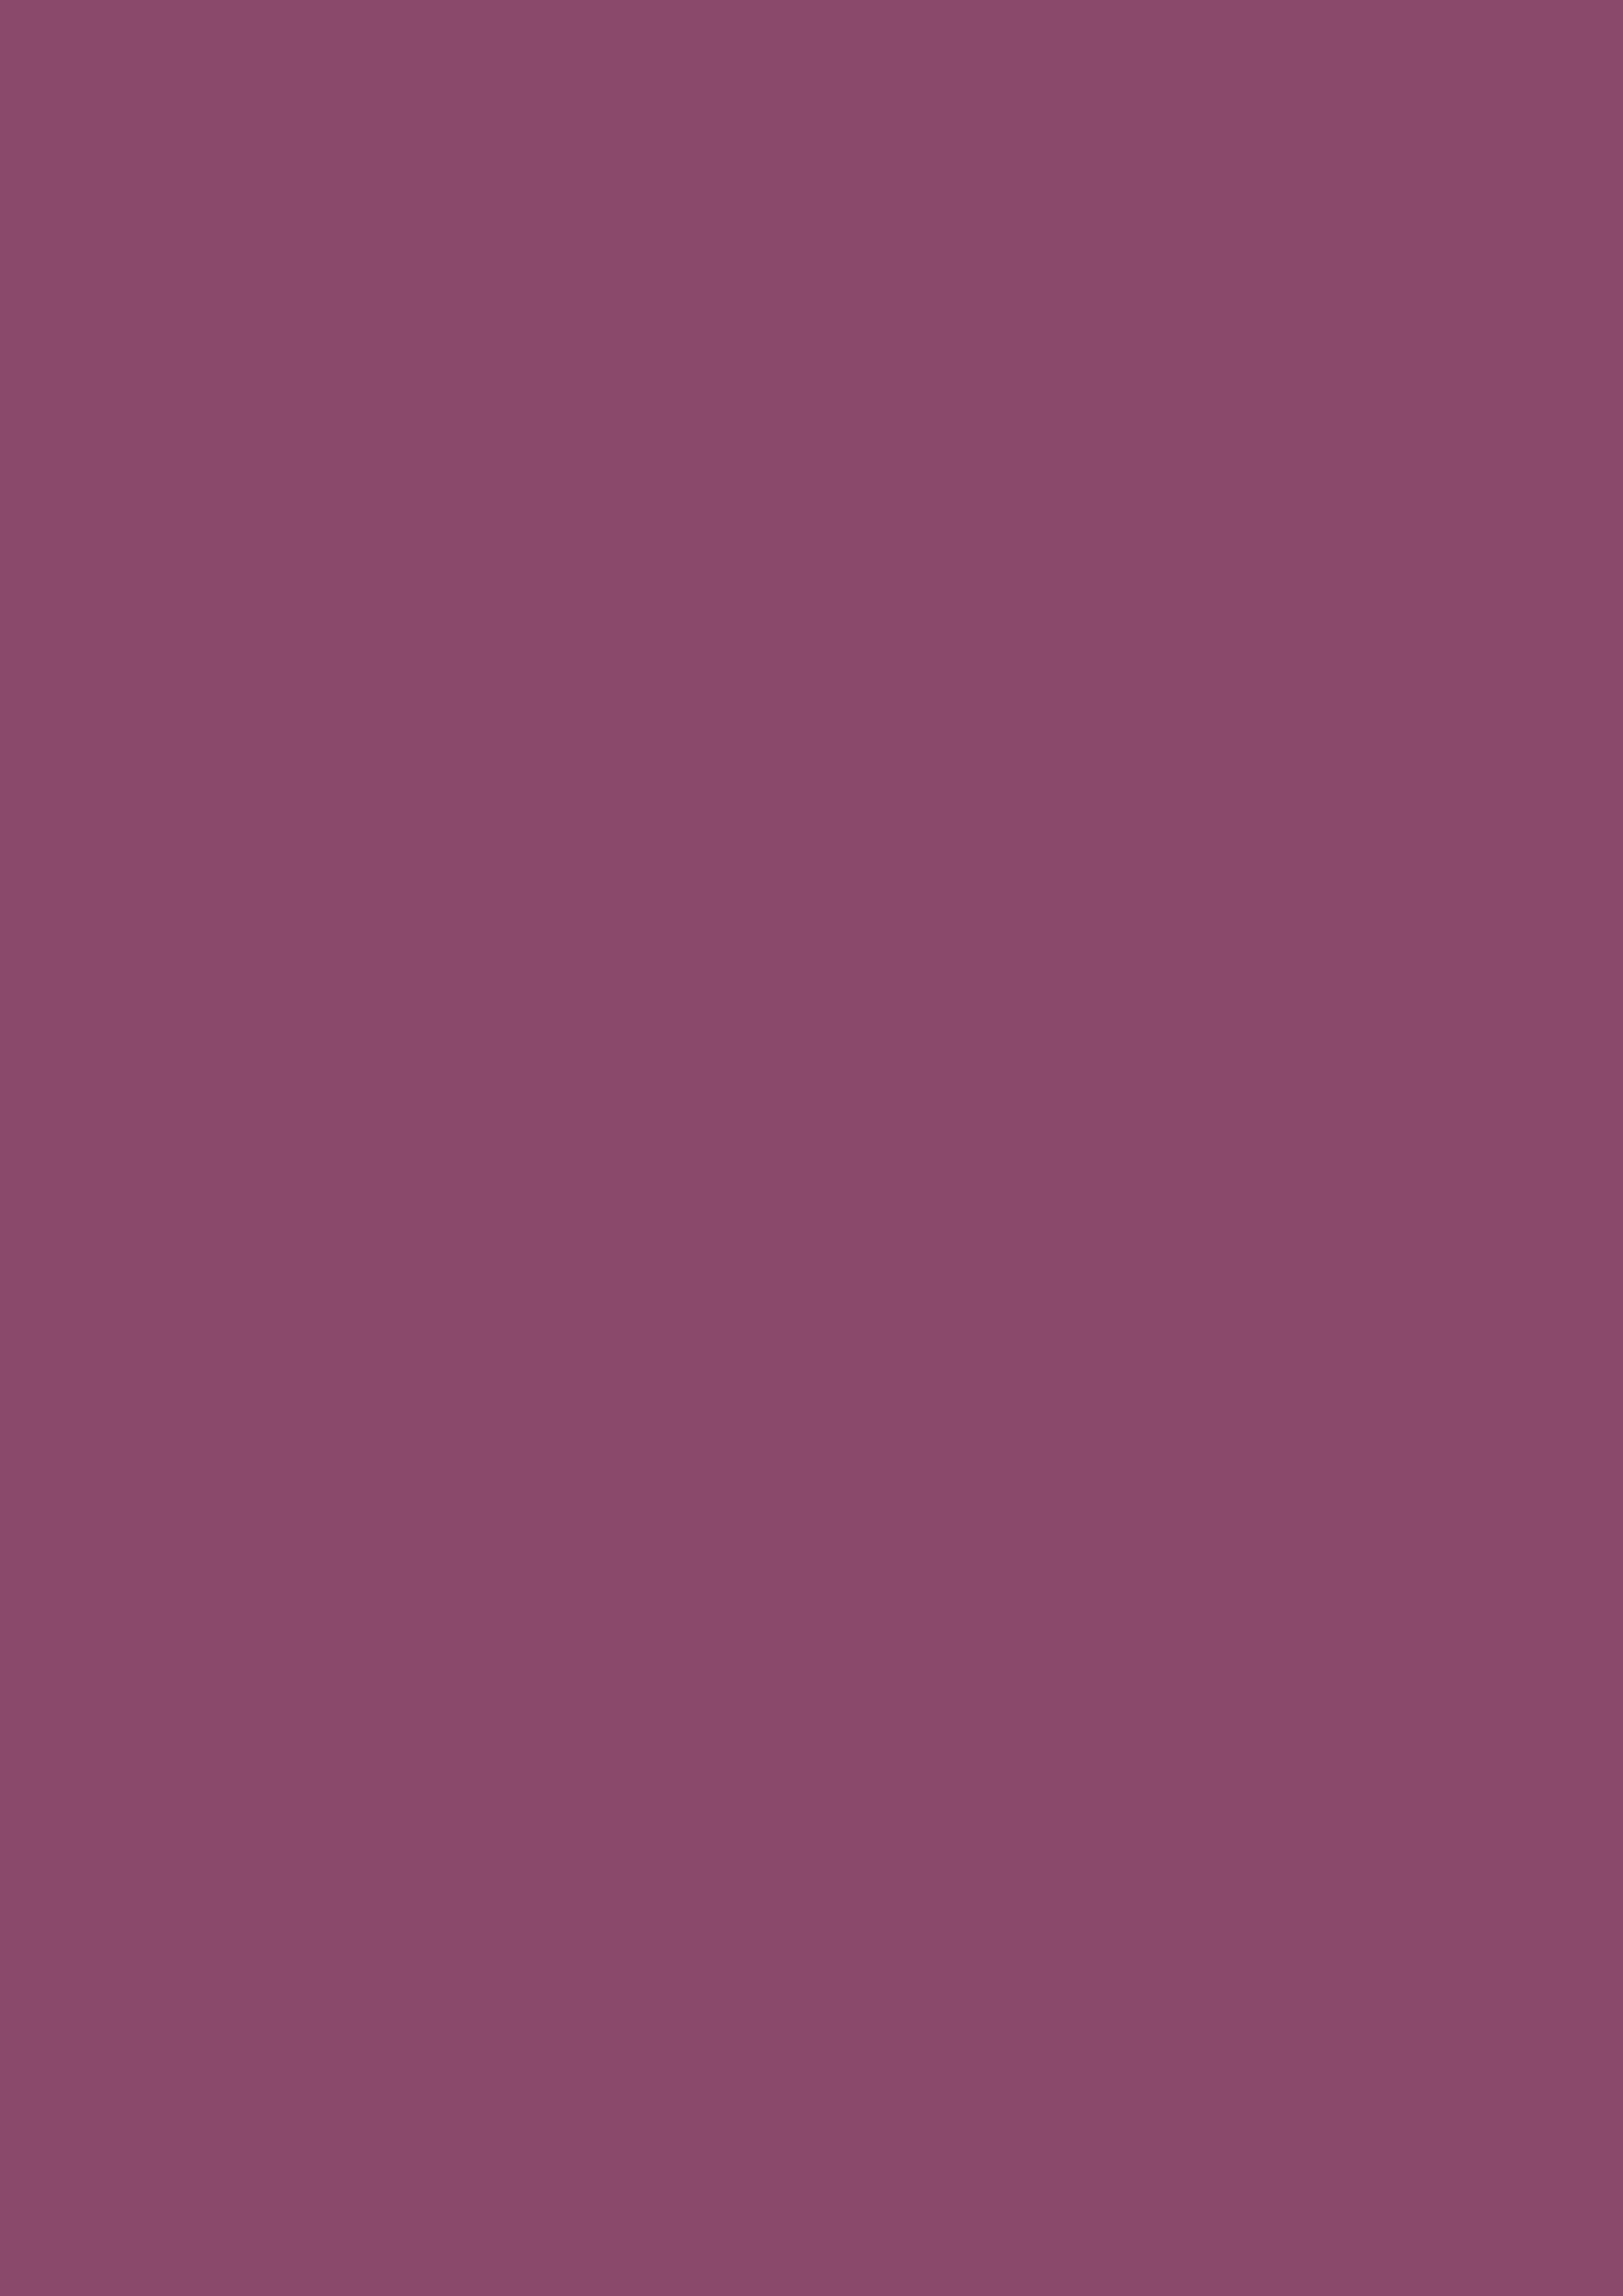 2480x3508 Twilight Lavender Solid Color Background